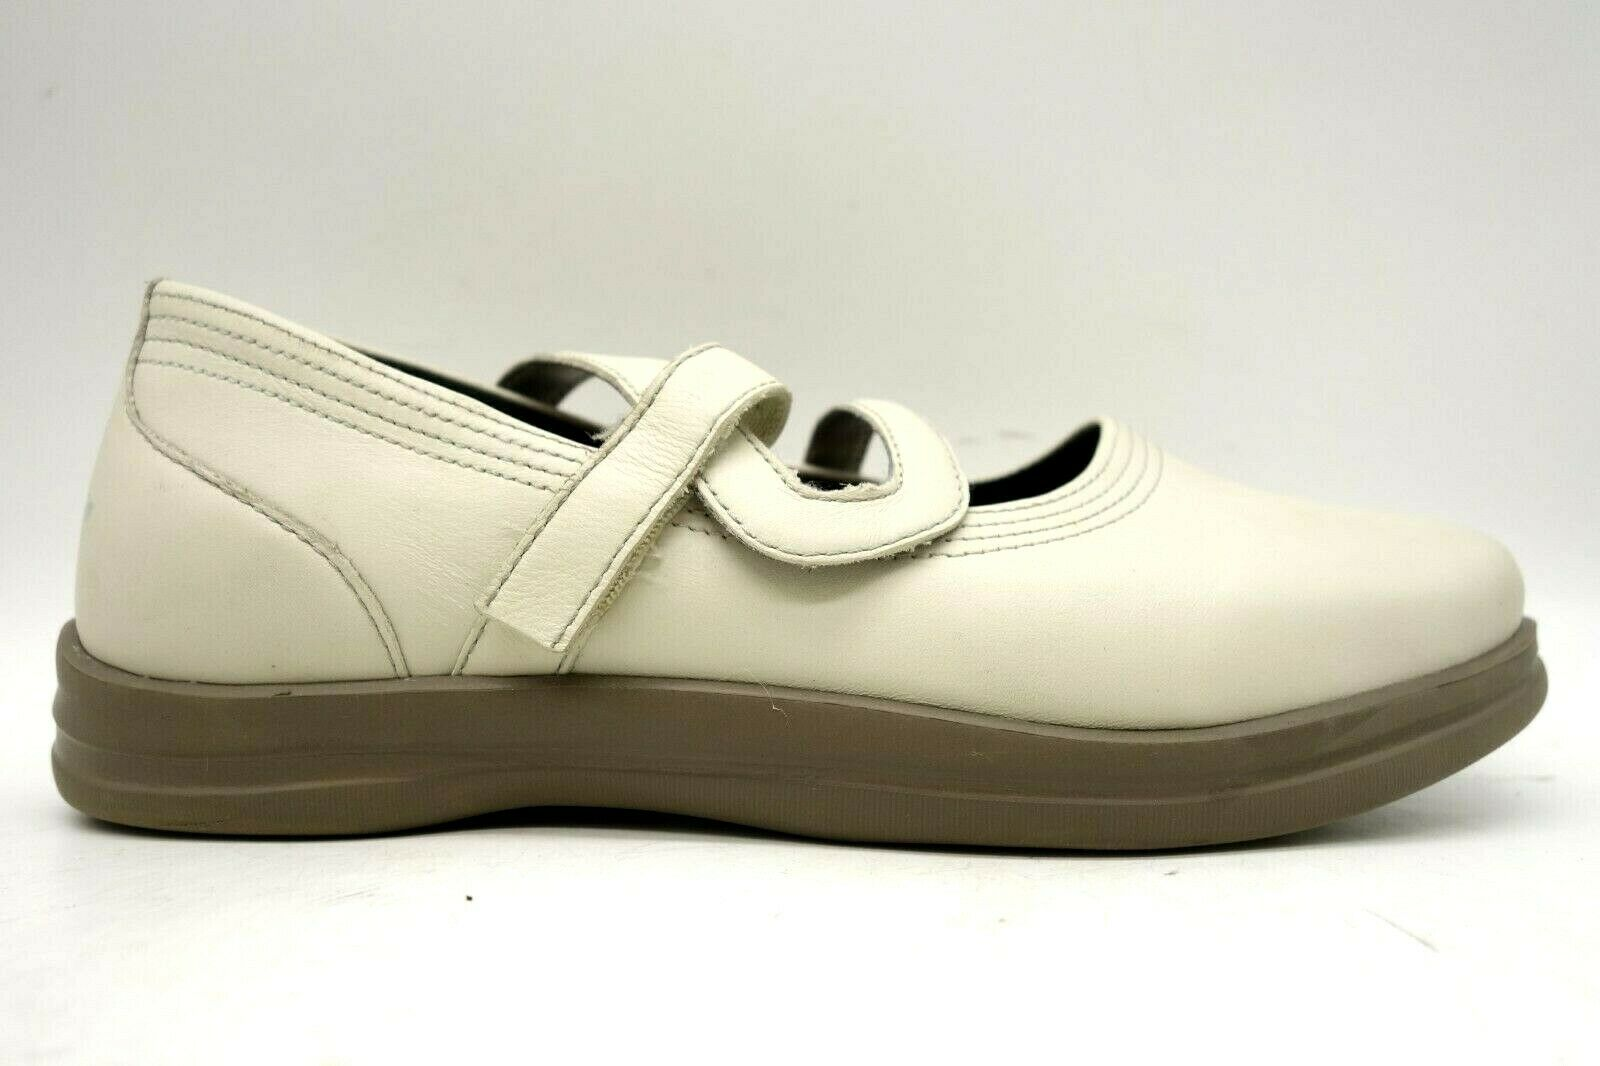 Apex Beige Leather Adjustable Slip Resistant Comfort Loafers Shoes Women's 9 XW